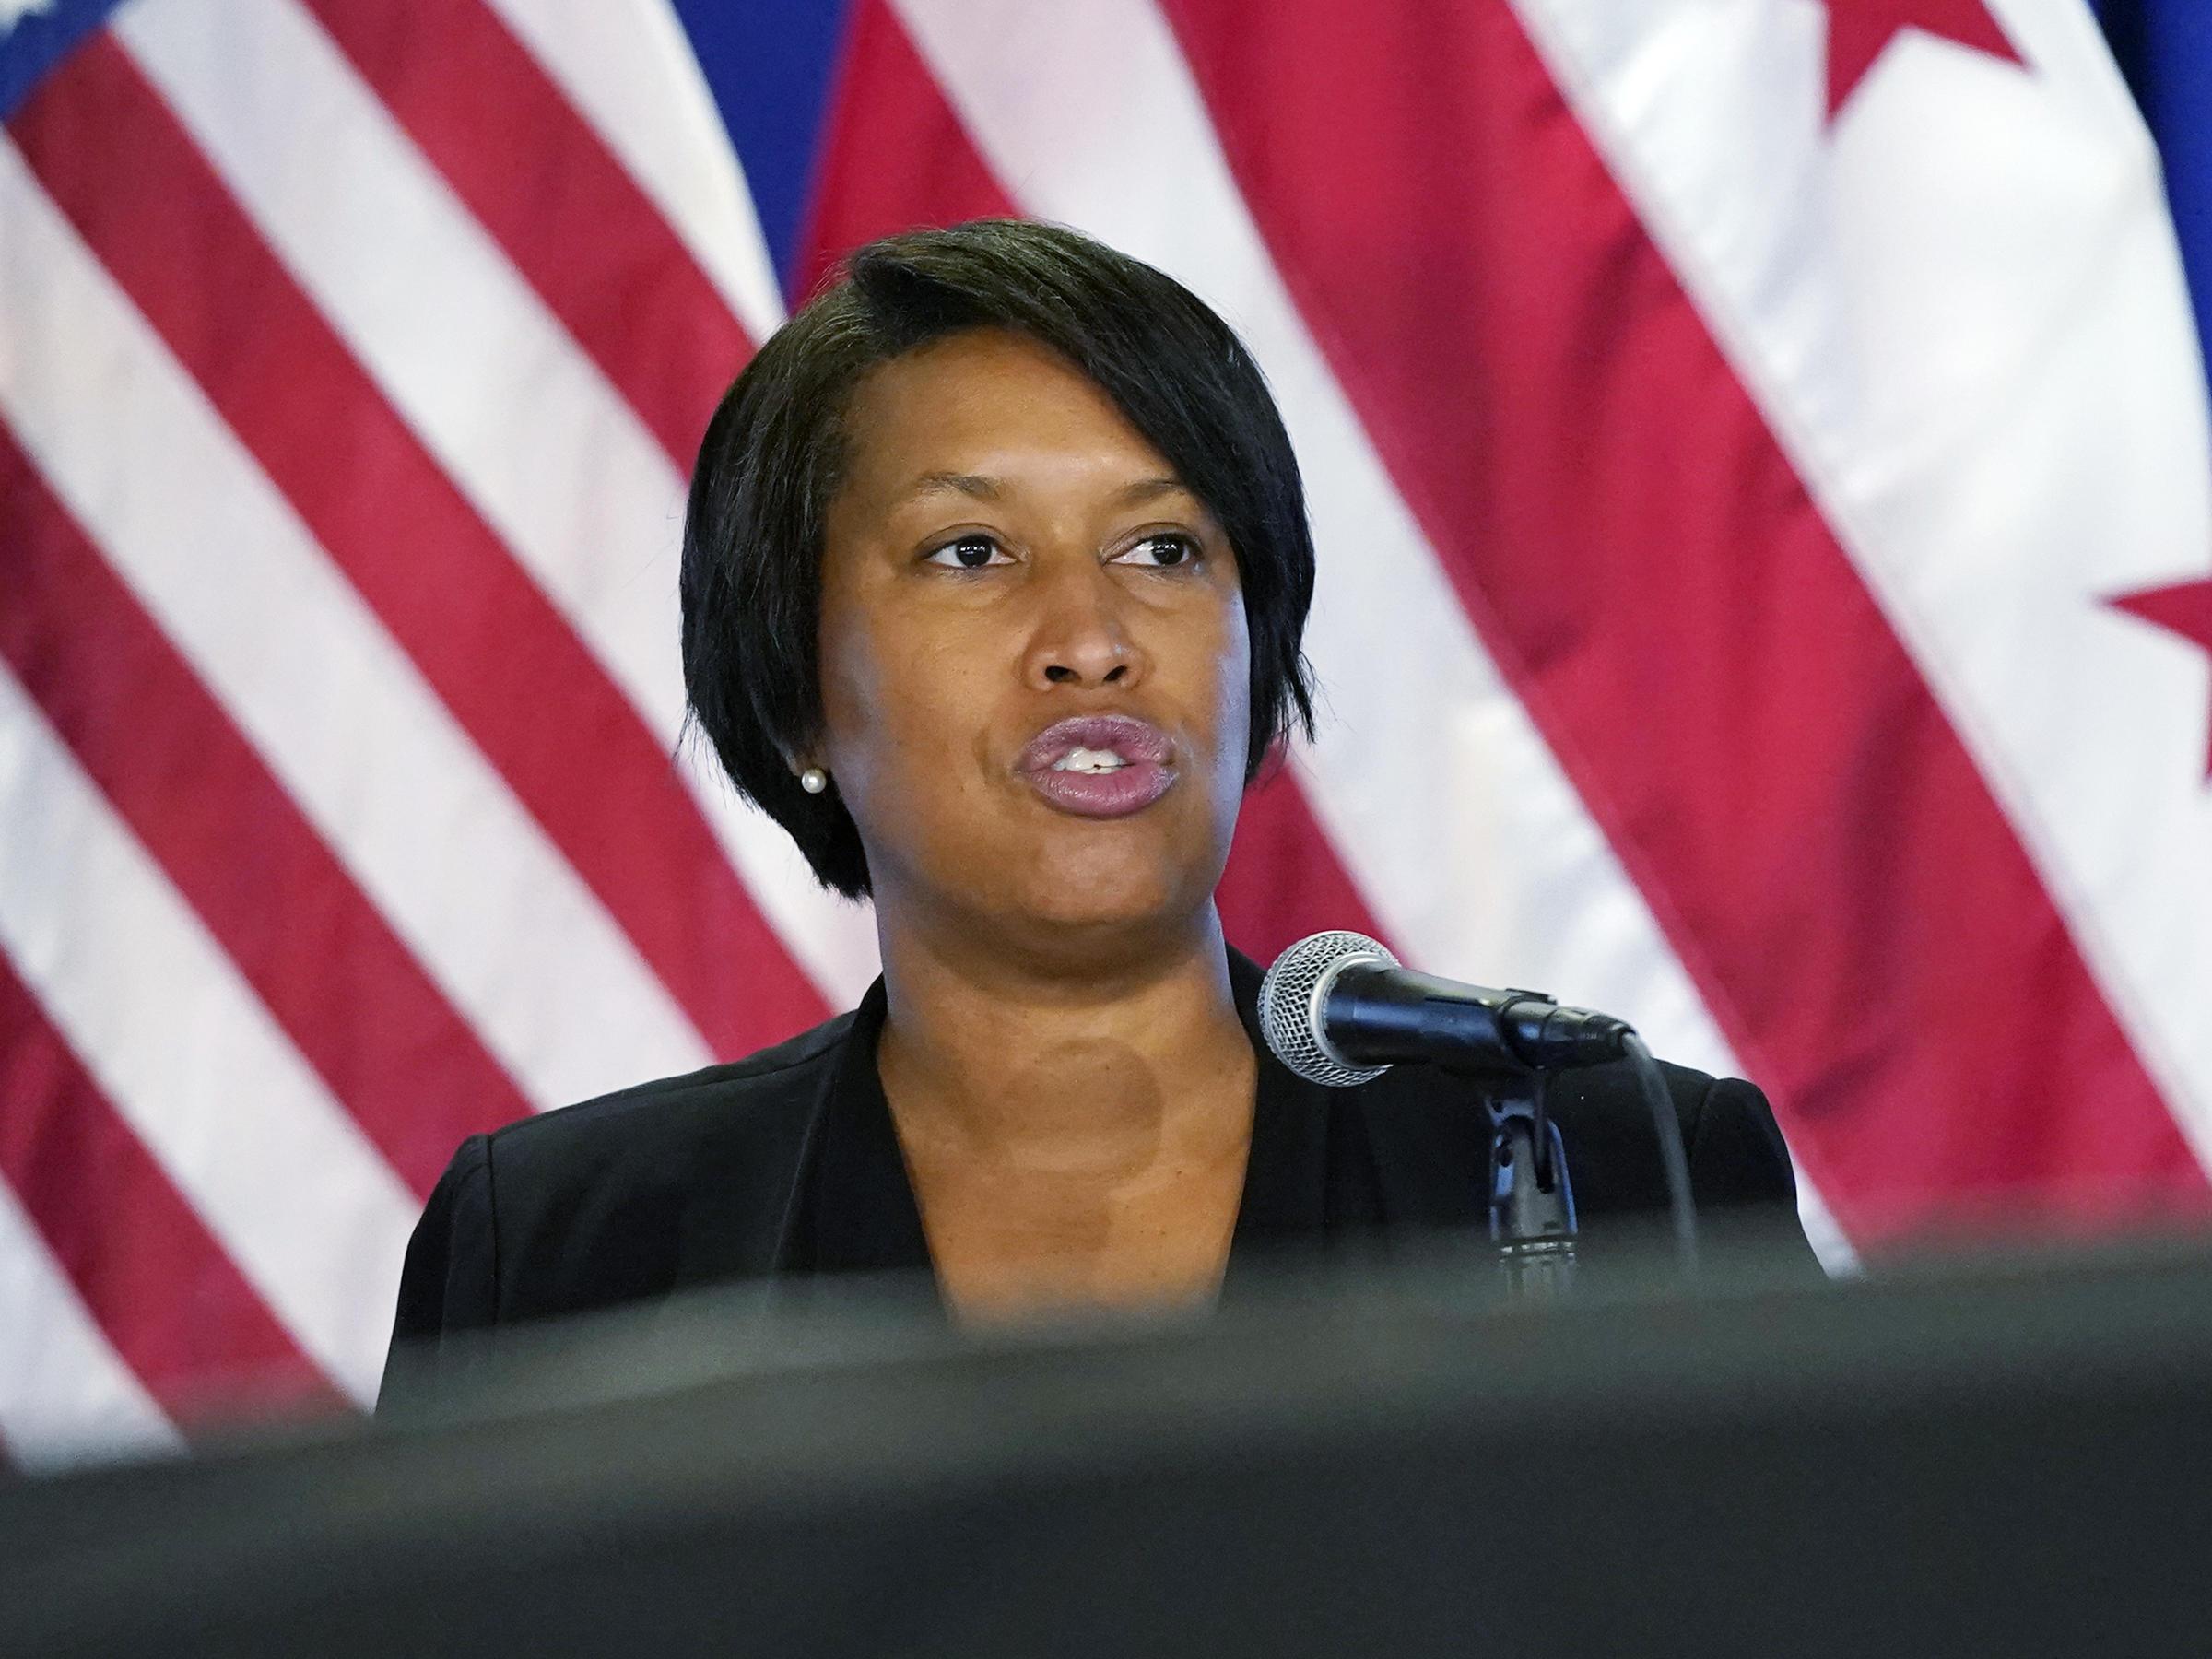 D.C. Mayor Bowser Blames Outside Agitators As Cause Of Weekend Violence |  90.5 WESA